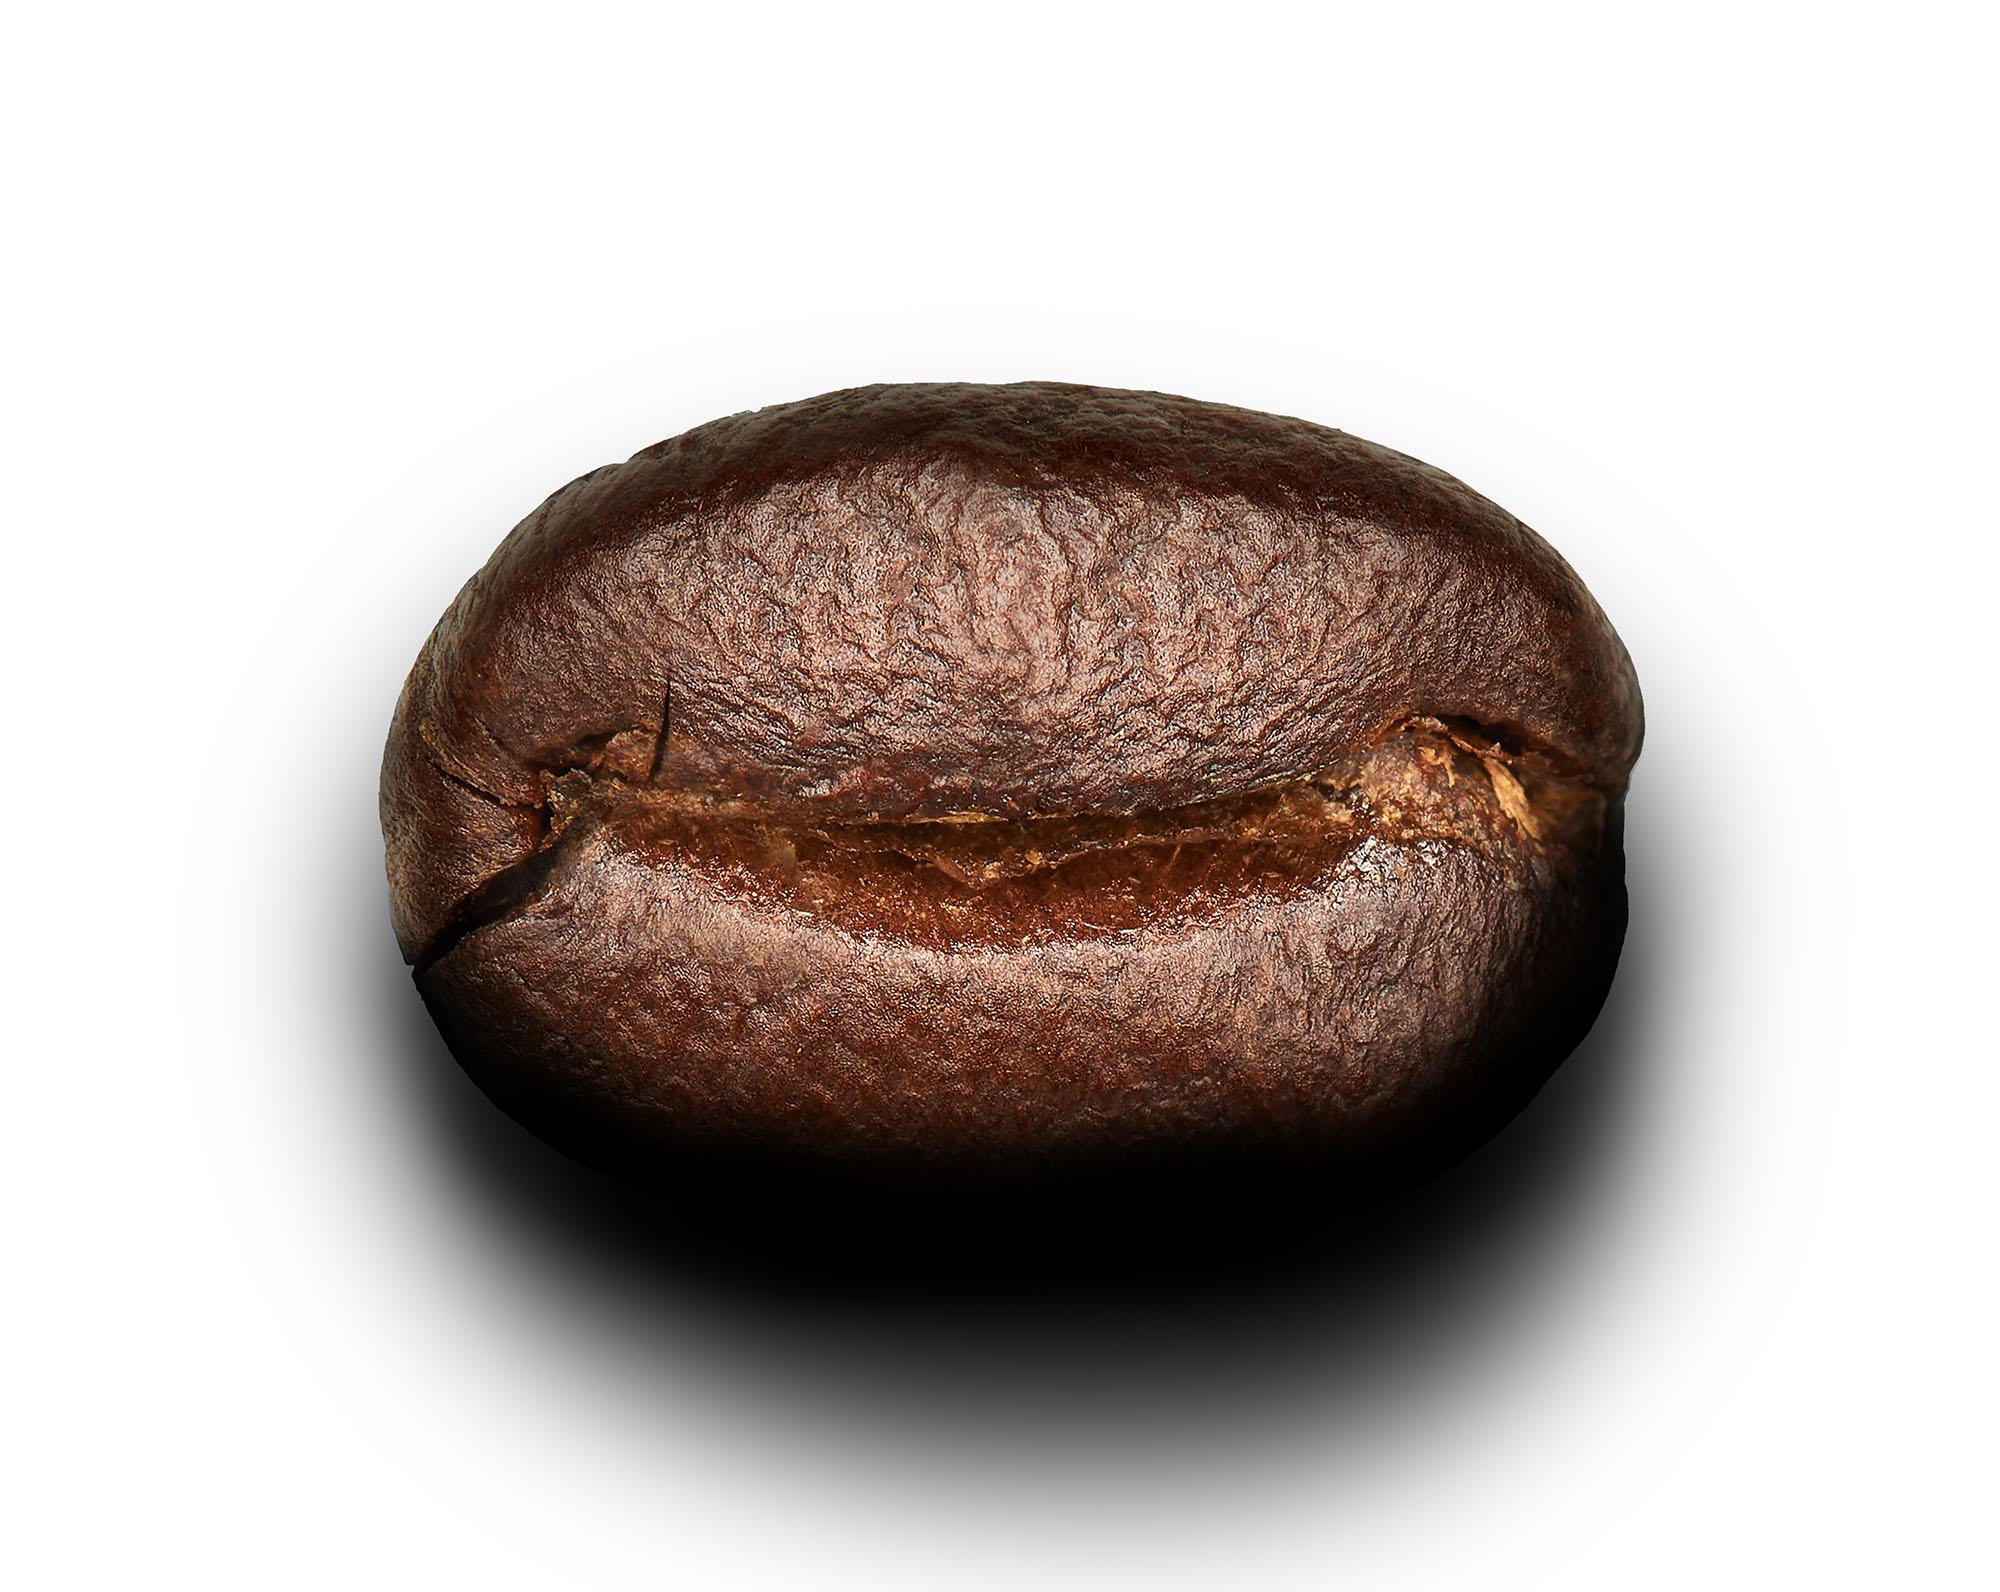 Ian Knaggs Commercial Packshot Photographer - Coffee Bean